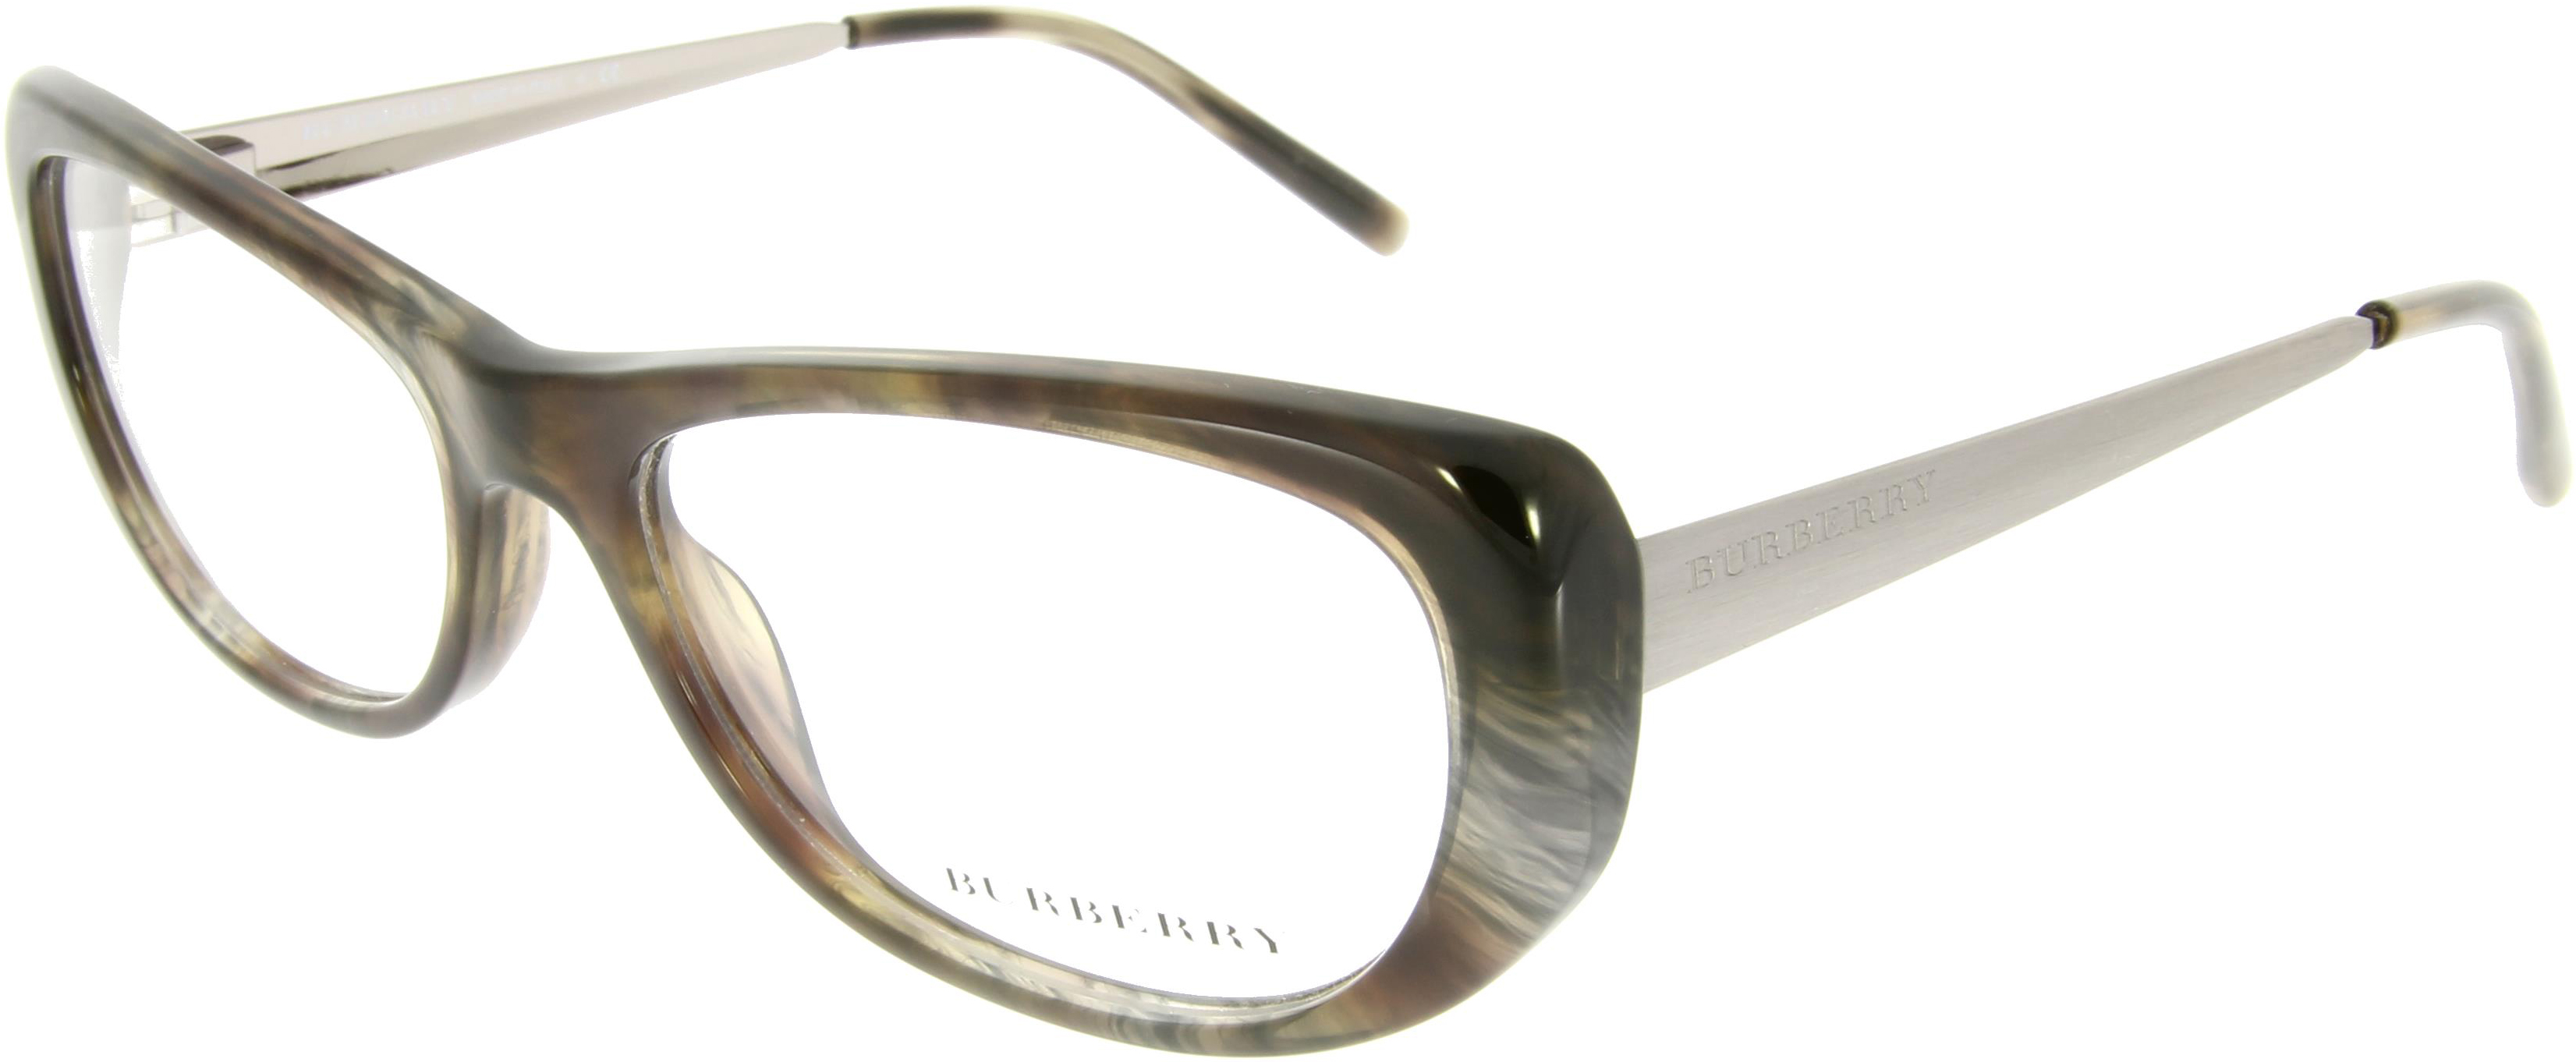 Burberry Brille Grau-Braun aus Kunststoff / Metall